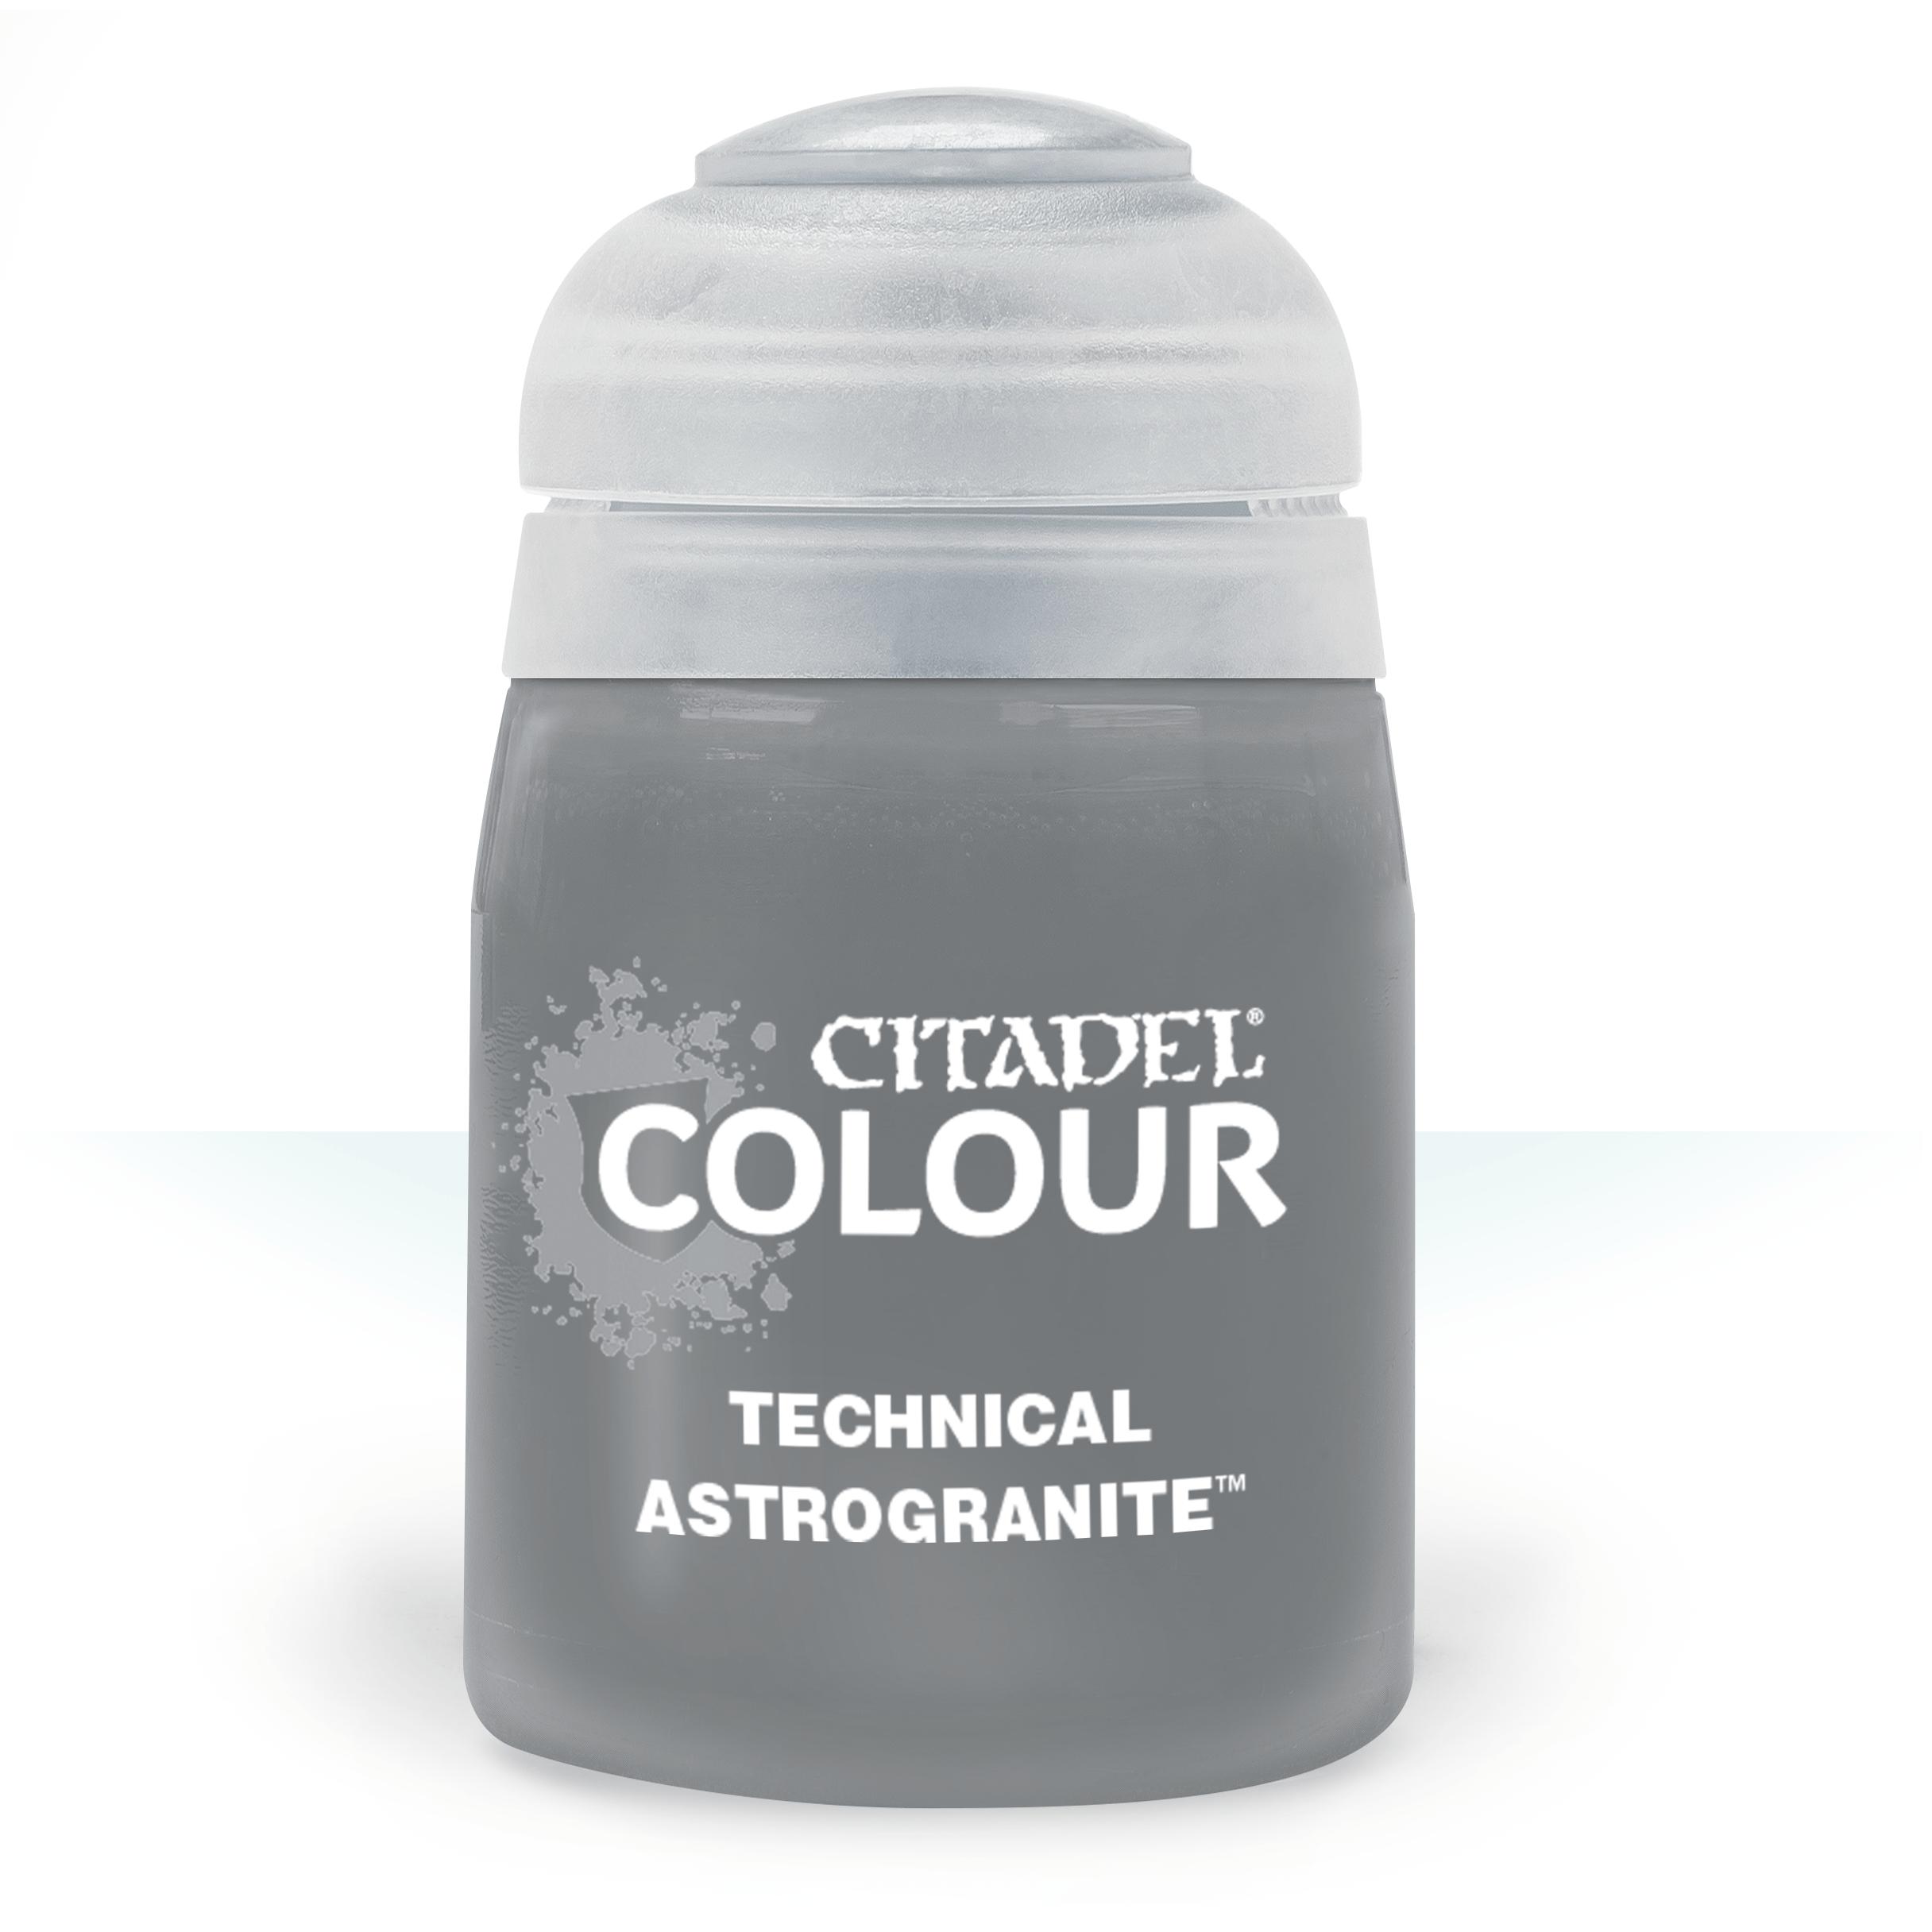 27-30 Technical Astrogranite 24ml